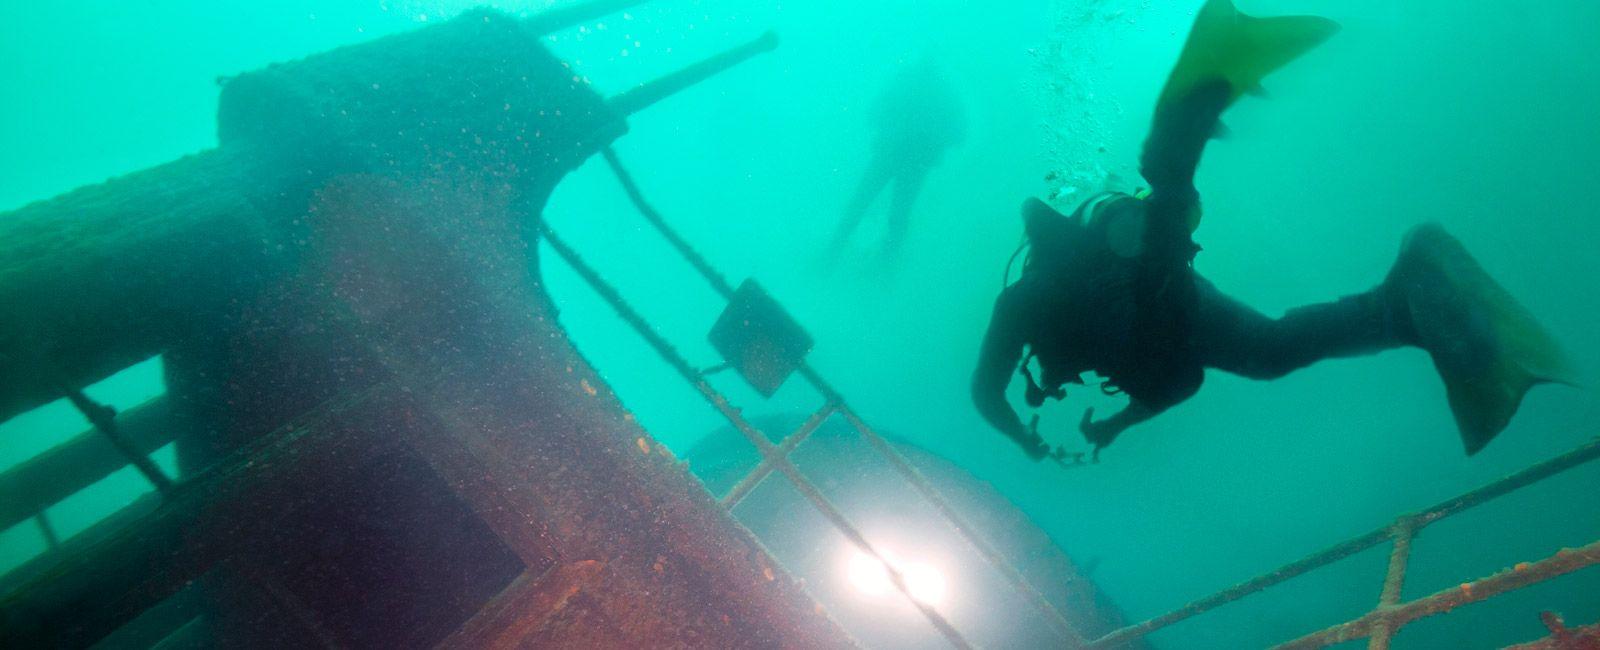 Tudor-Great-Lakes-Diving-Gear-Patrol-Ambiance-2